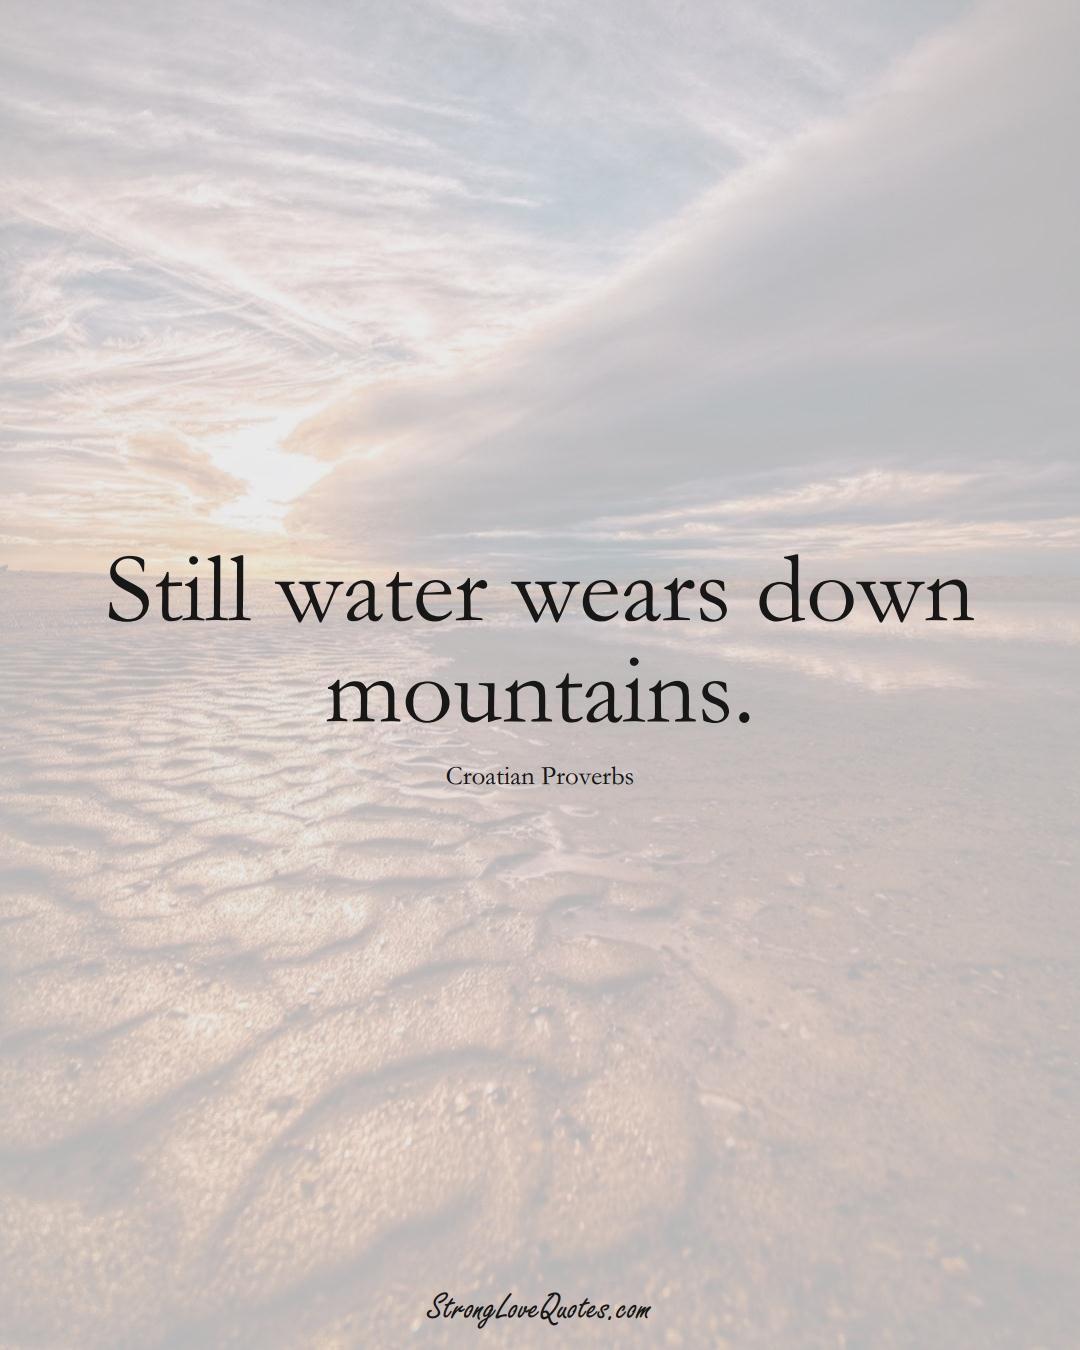 Still water wears down mountains. (Croatian Sayings);  #EuropeanSayings